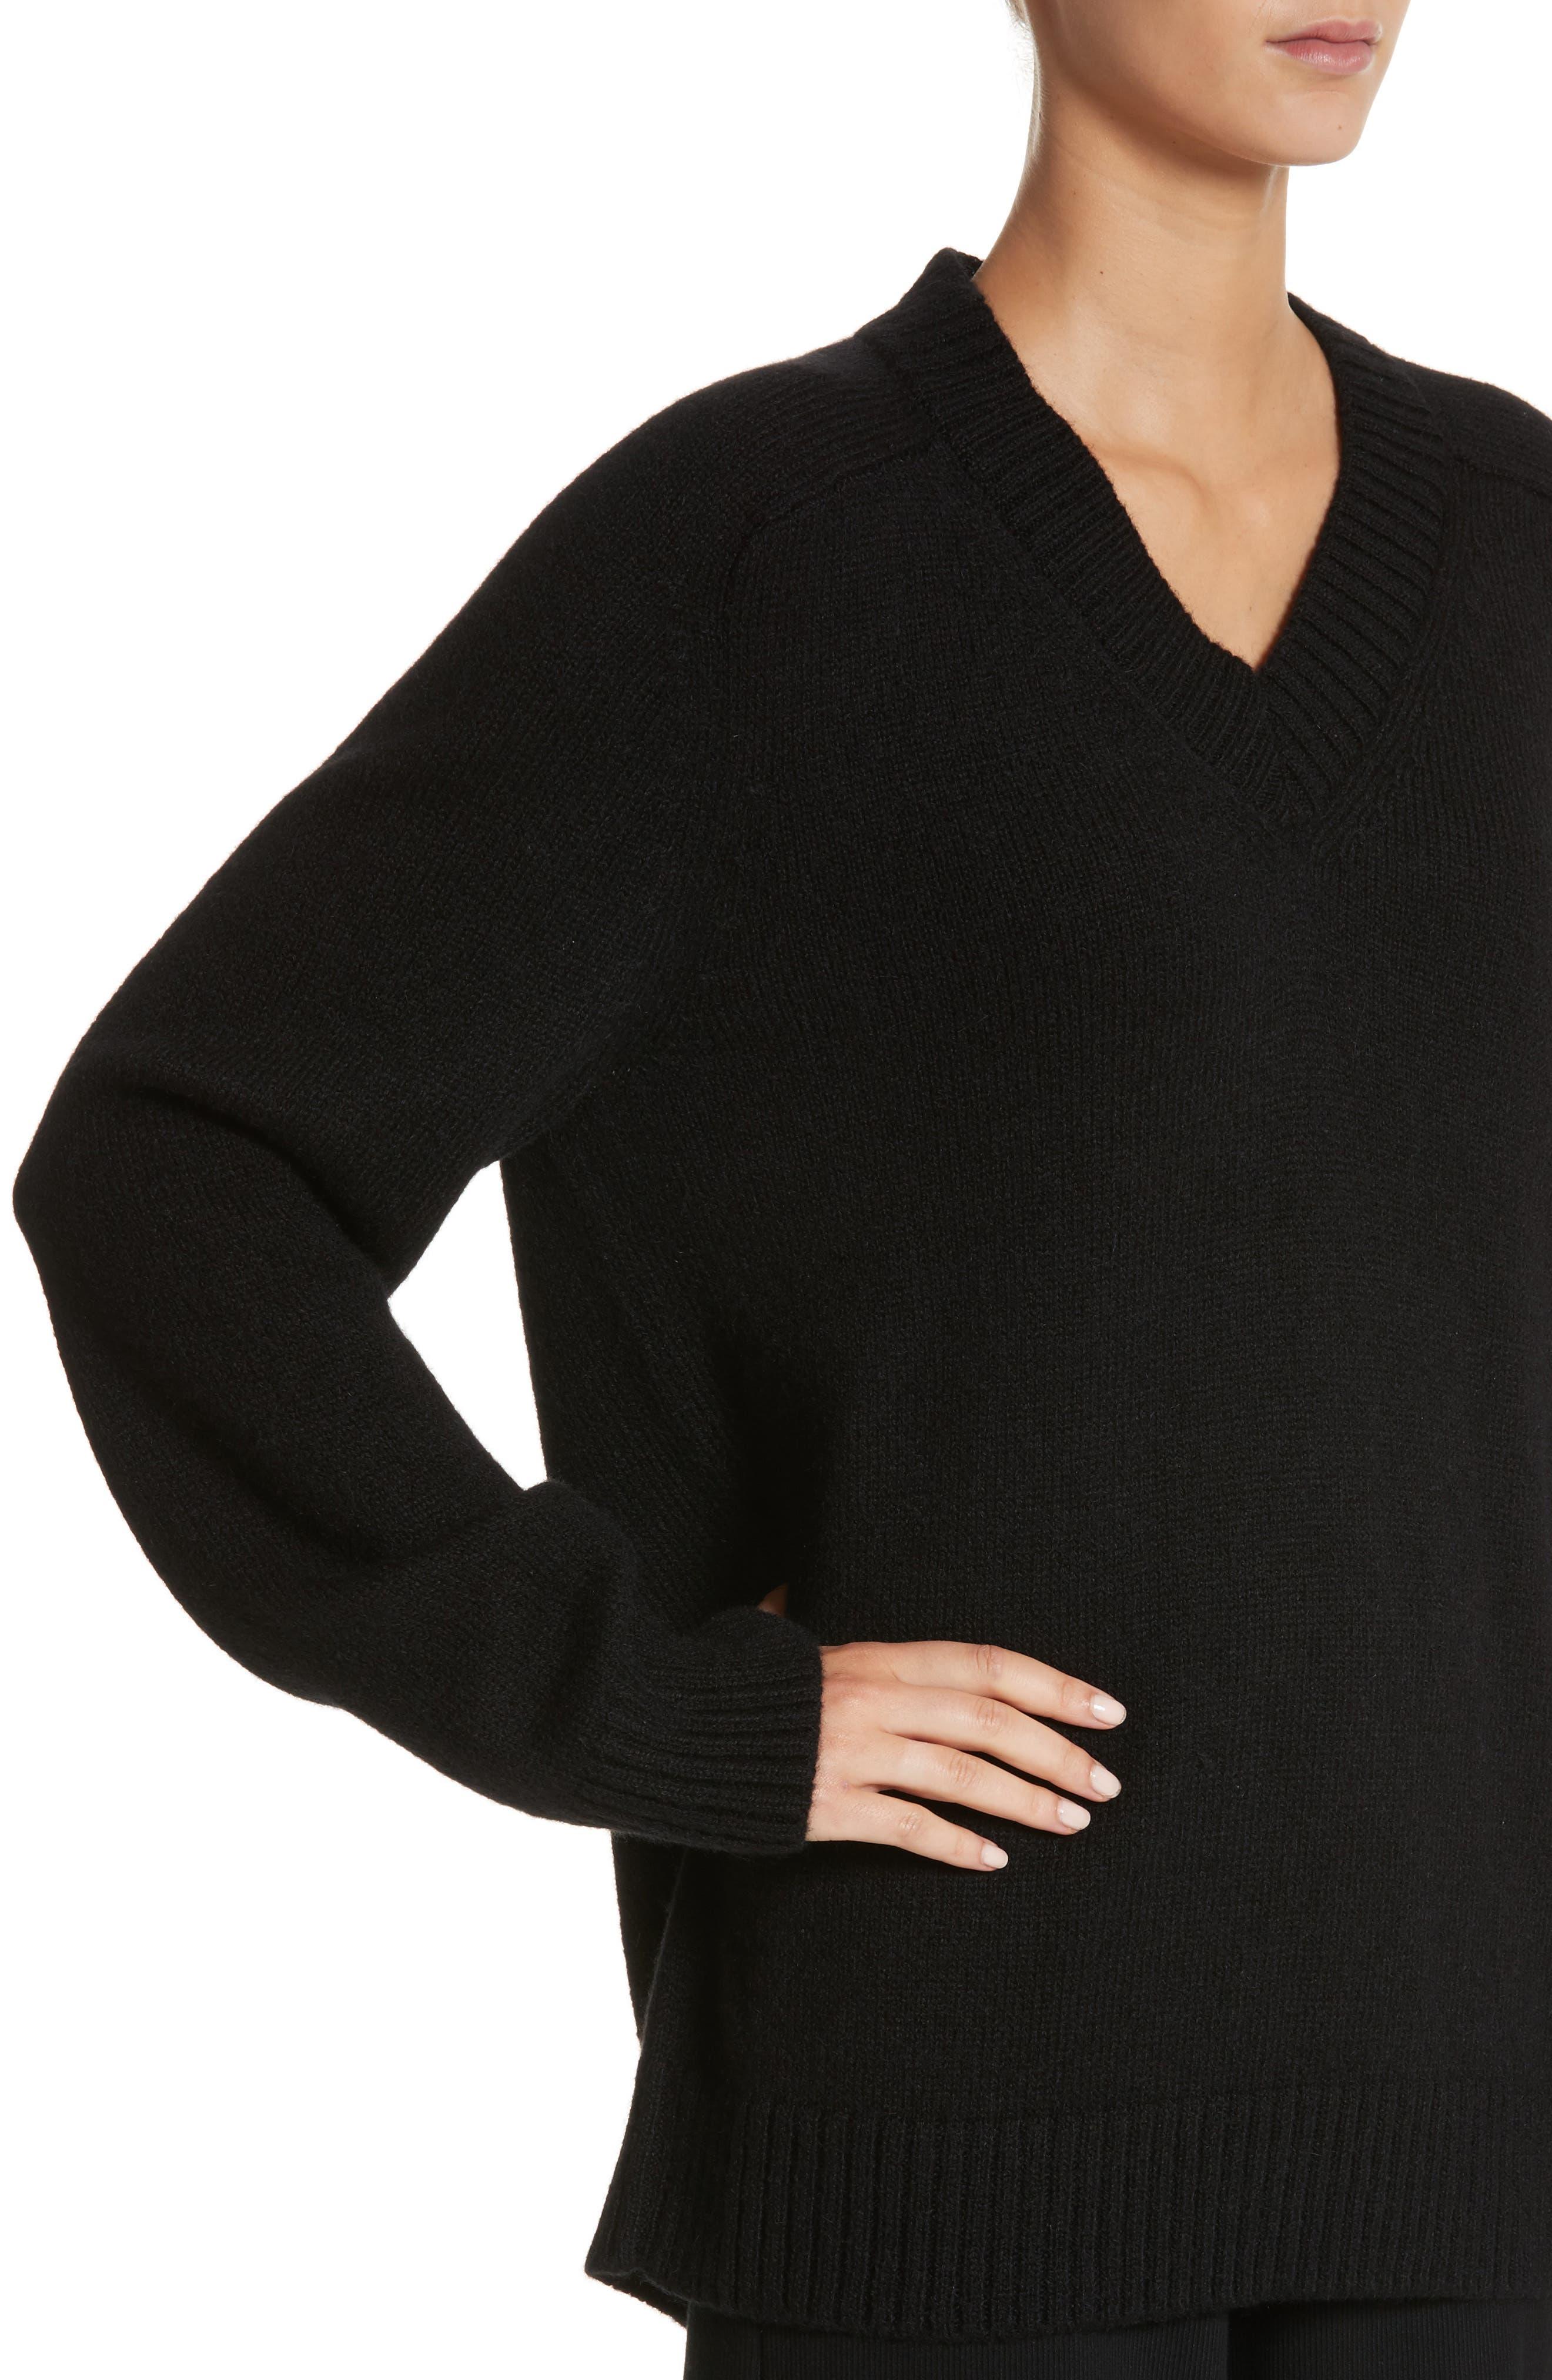 Alpaca Blend V-Neck Sweater,                             Alternate thumbnail 4, color,                             001